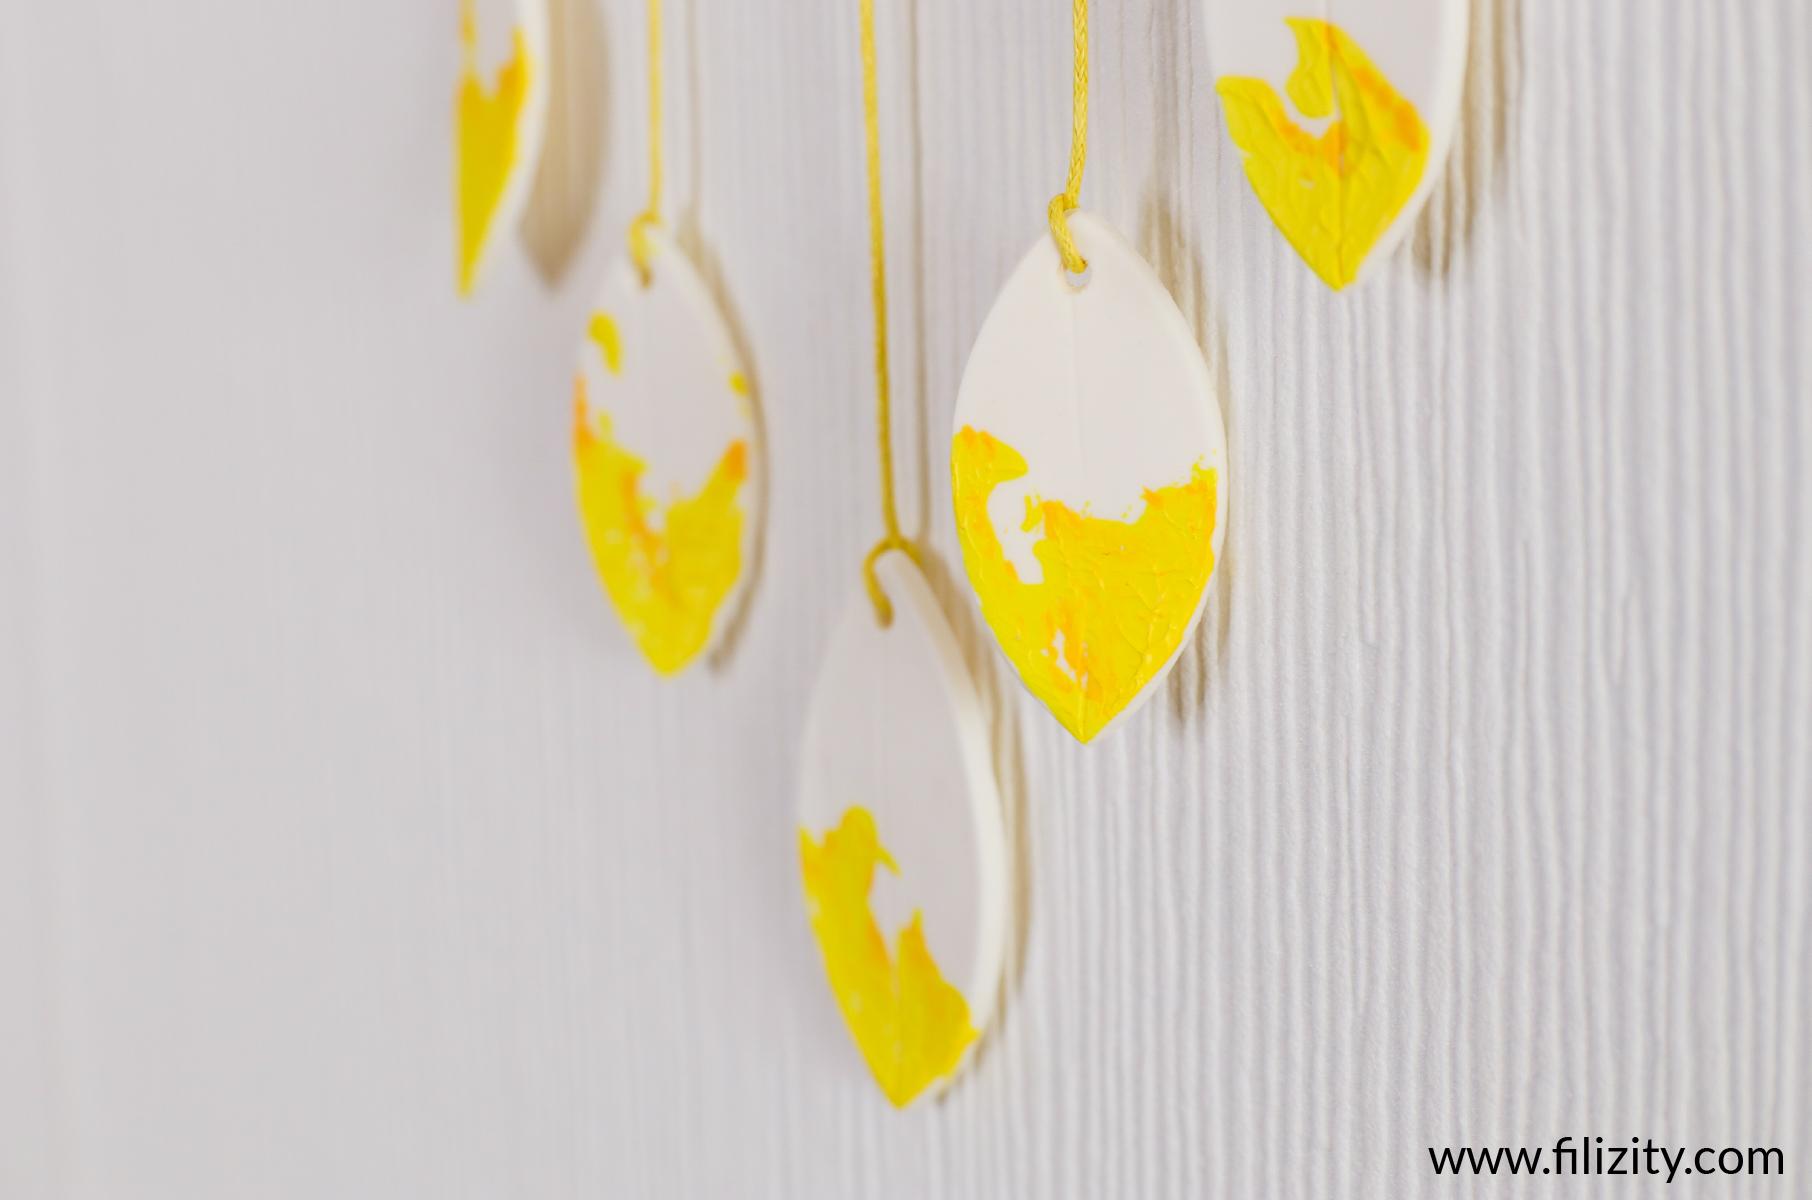 Blätter-Wanddeko aus Kaltporzellan selber machen | Filizity. Kreativmagazin & DIY-Blog #kaltporzellan #wanddeko #minimalistisch